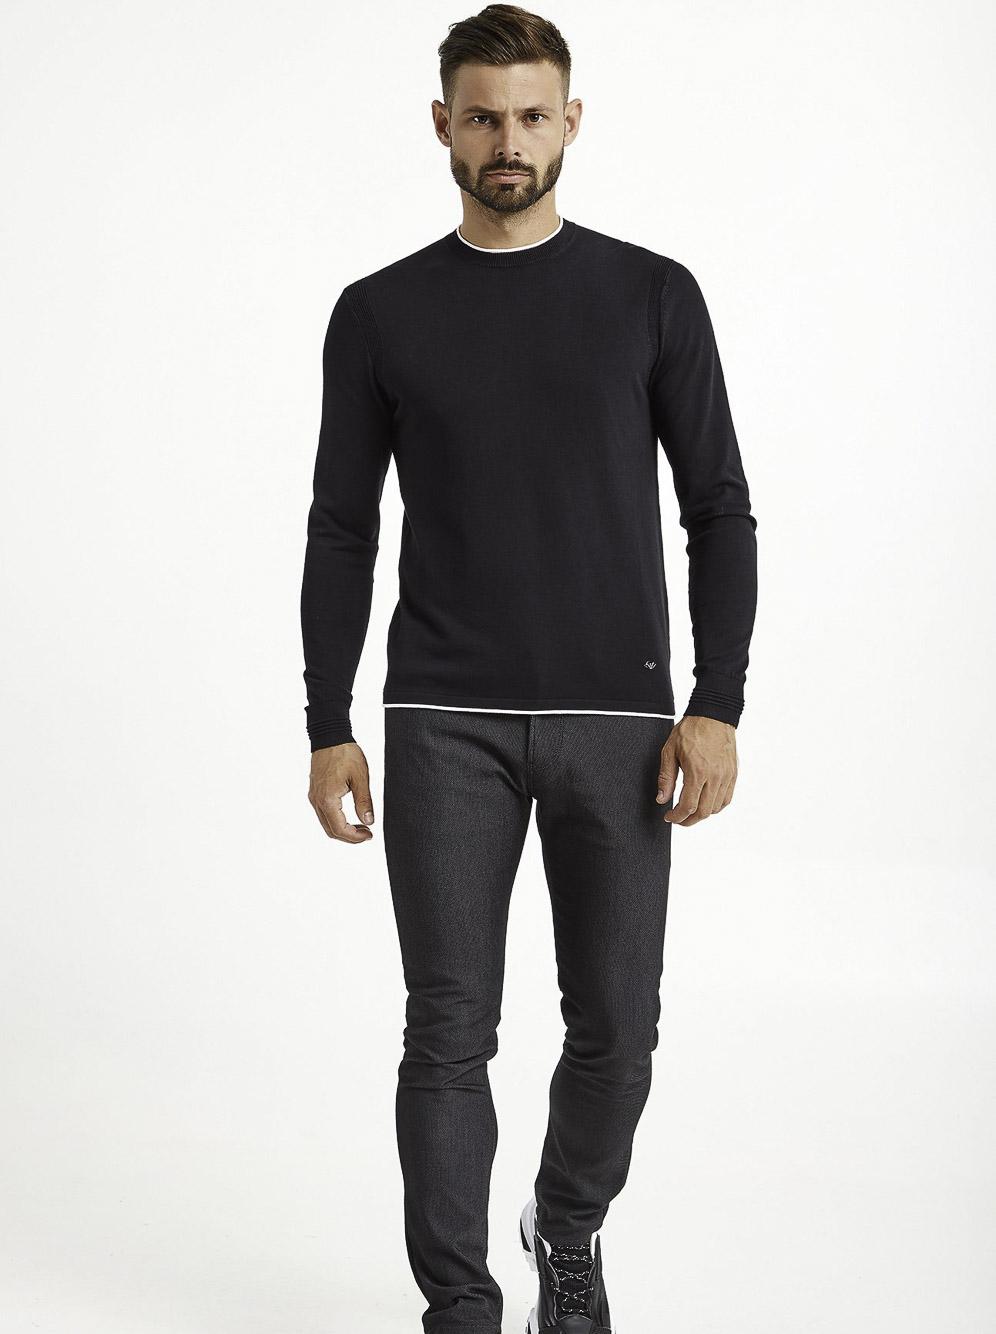 EMPORIO ARMANI Μπλούζα πουλόβερ 6H1MX2 1MIQZ-0920 ΜΠΛΕ